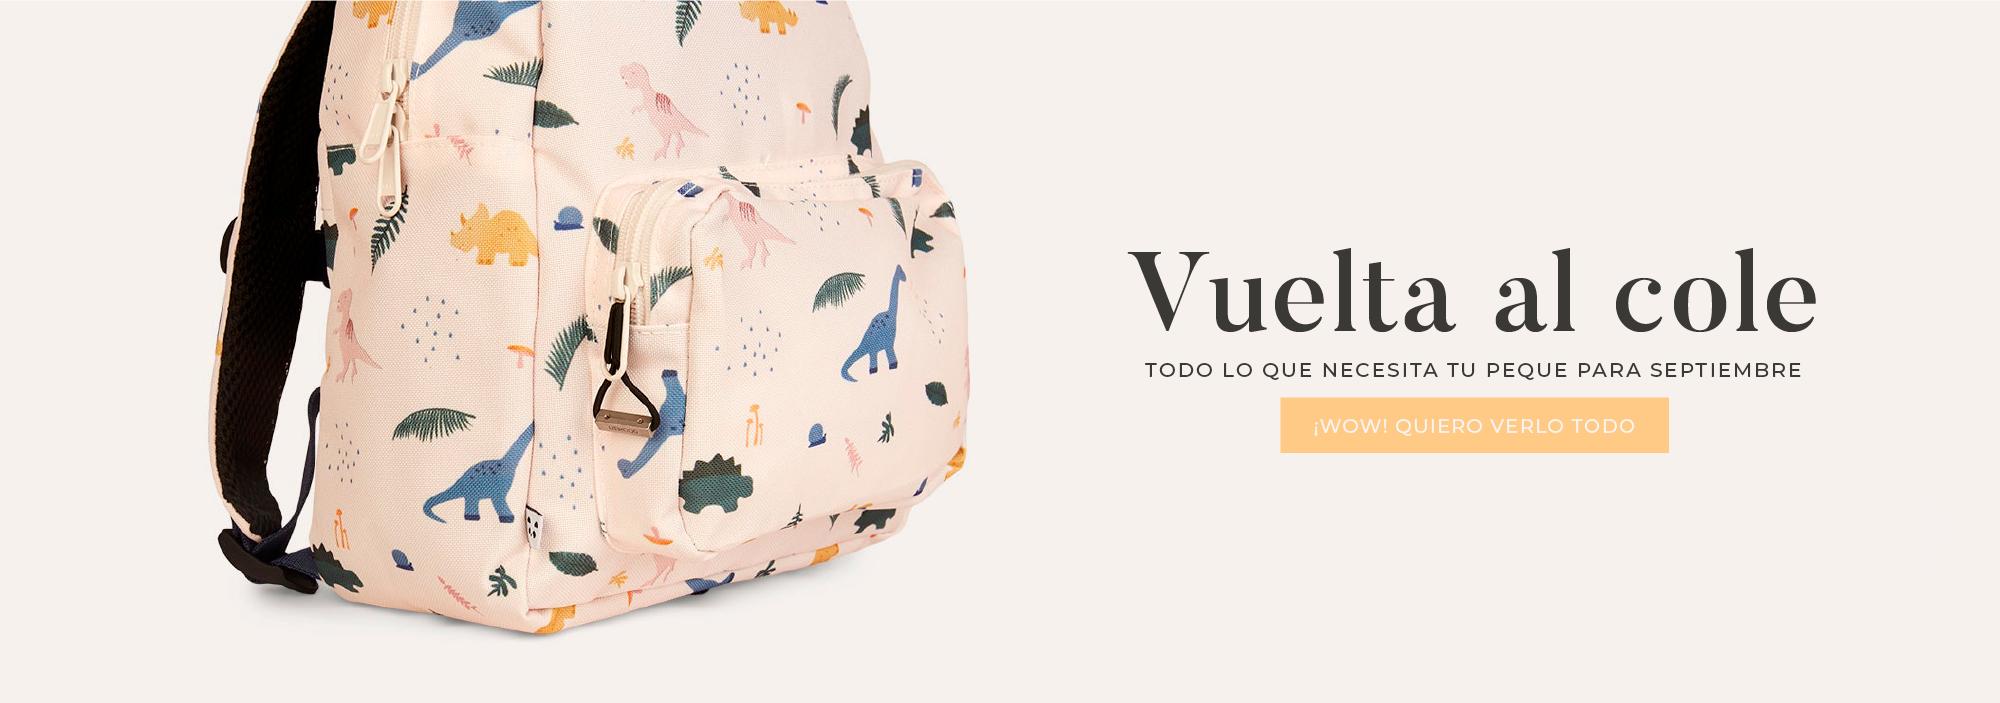 Banner-Web-Vuelta-Cole-2021